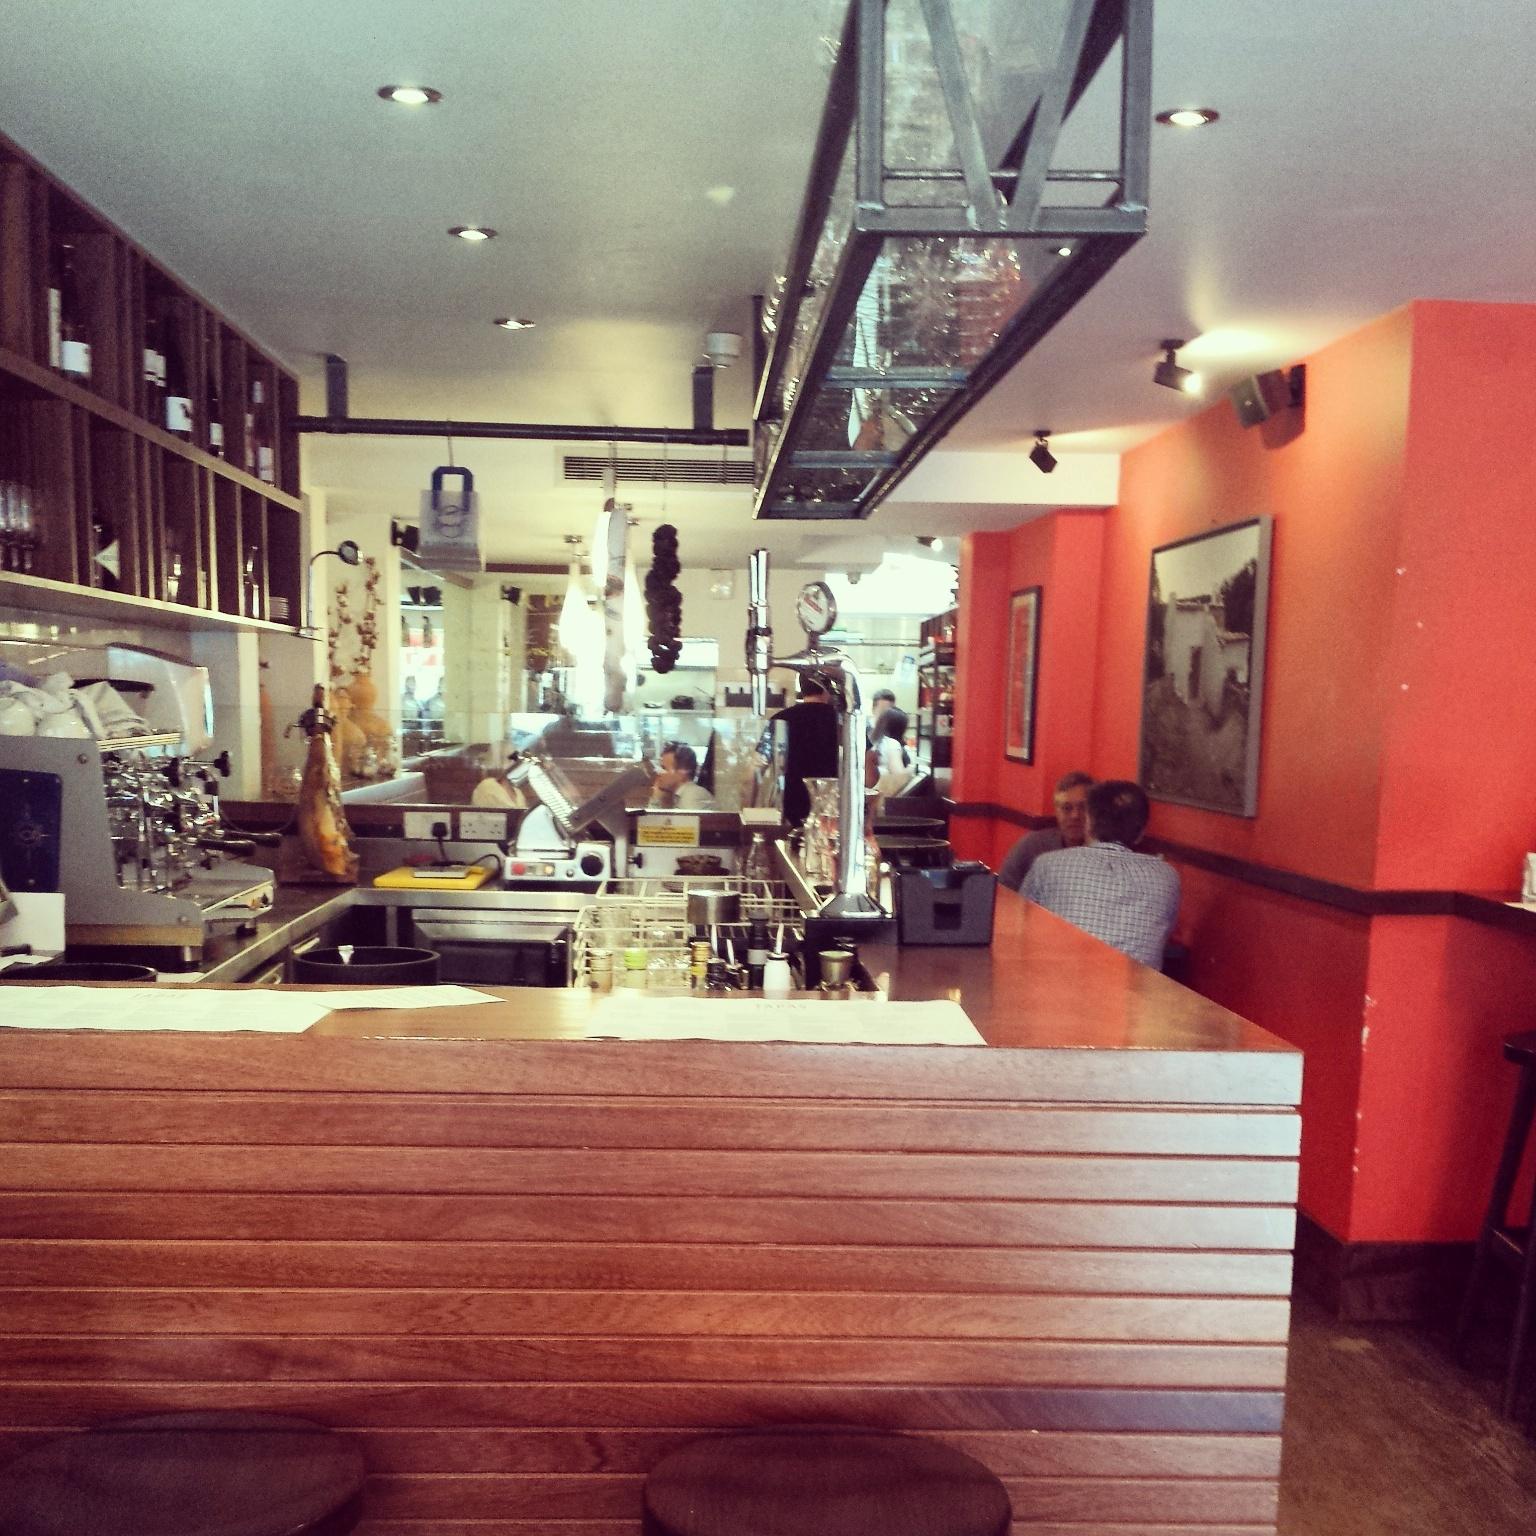 Tapas at Brindisa, Soho – have you heard the latest